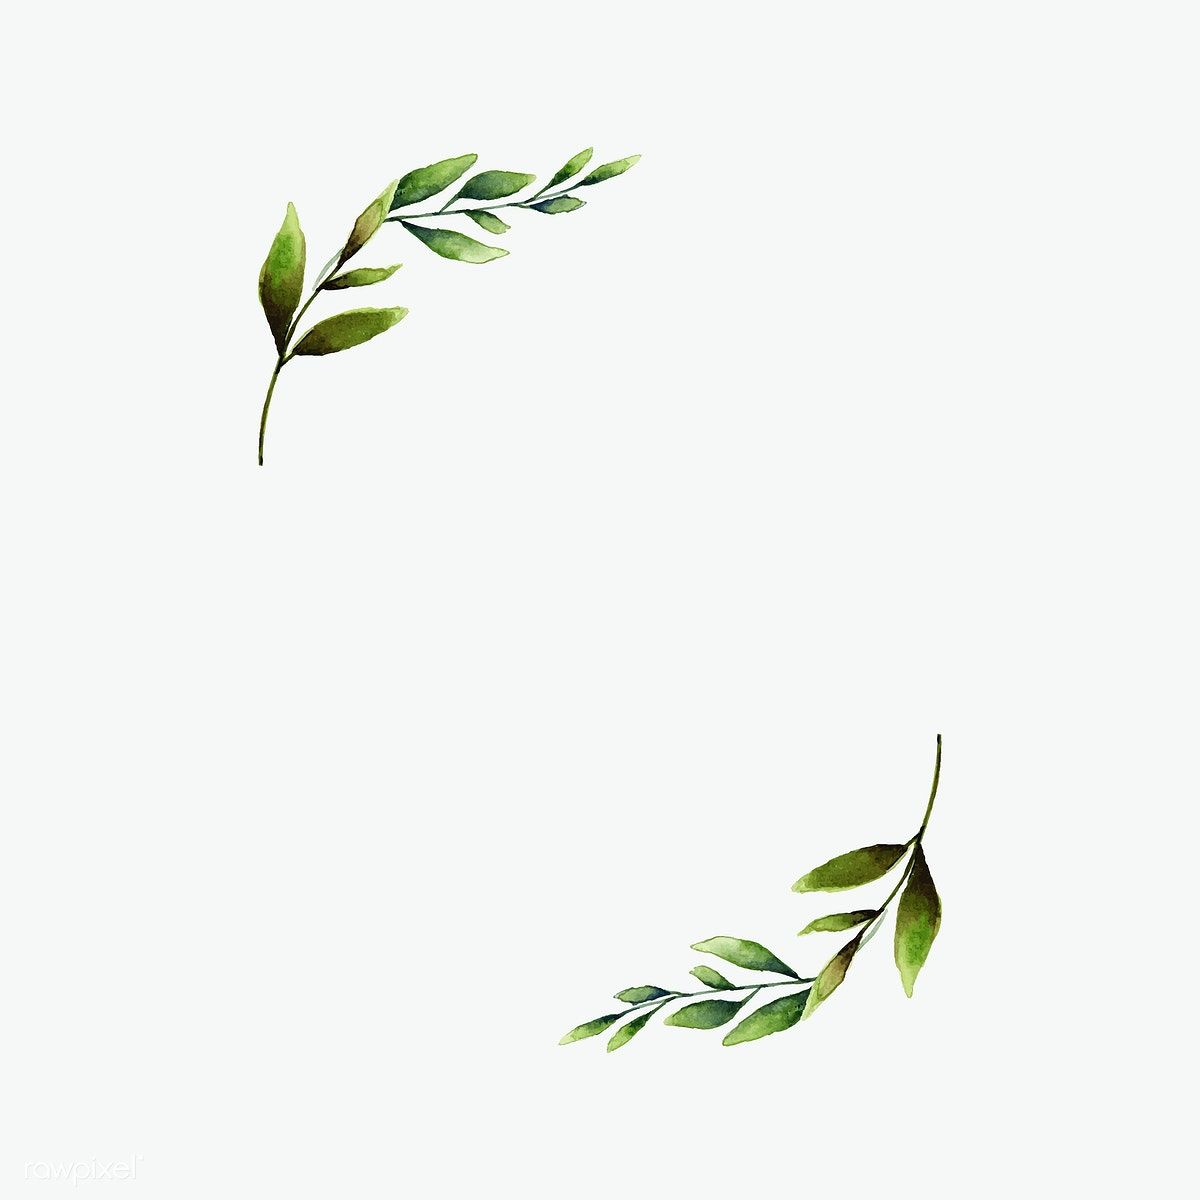 Hand Drawn Olive Branch Frame Watercolor Style Vector Free Image By Rawpixel Com Aum Suluboya Cicekler Dugun Karti Bitki